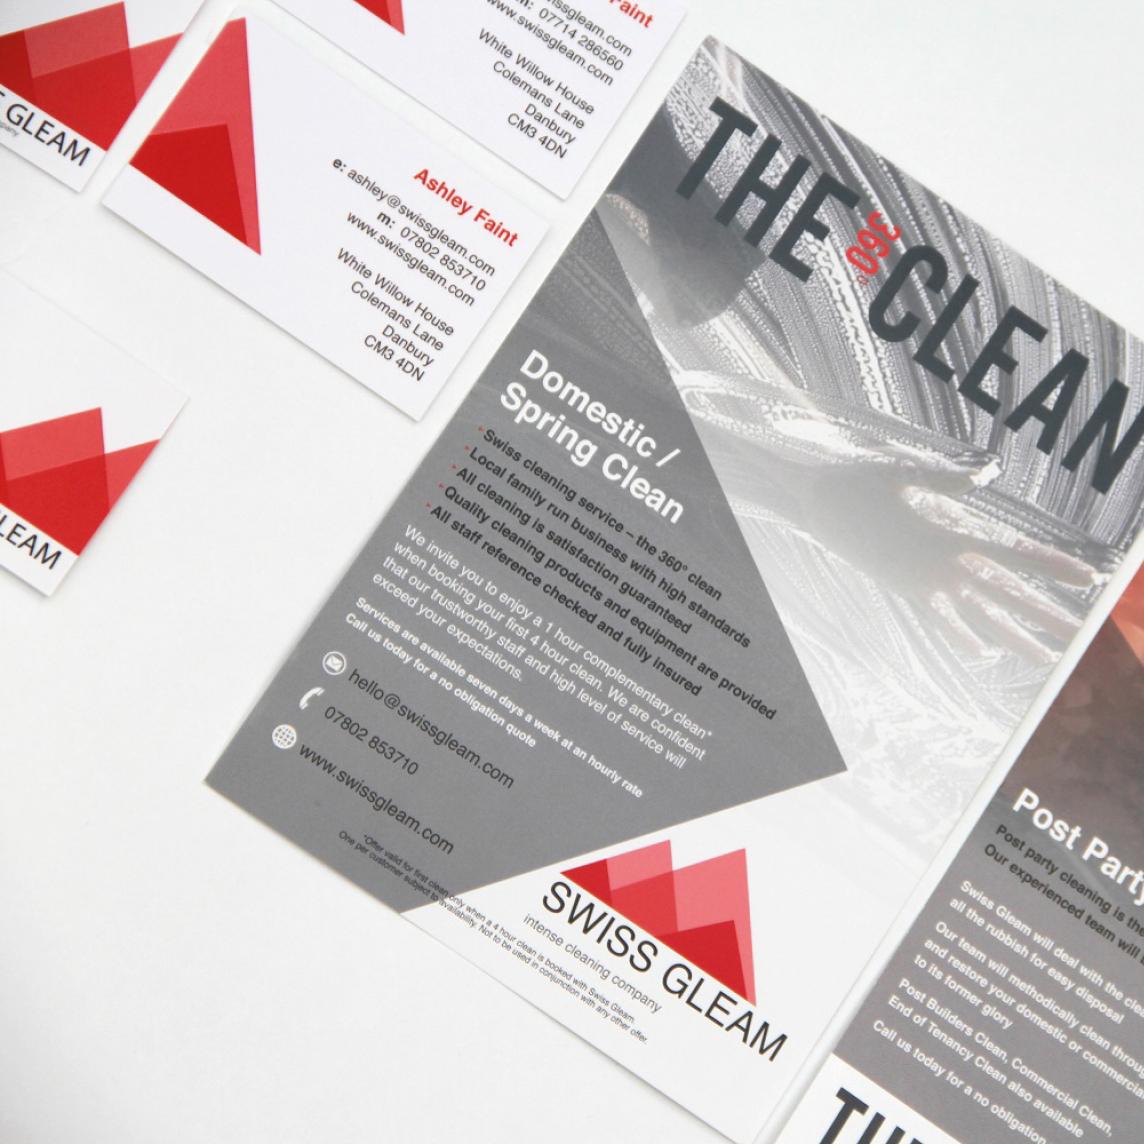 Swiss Gleam Flyer